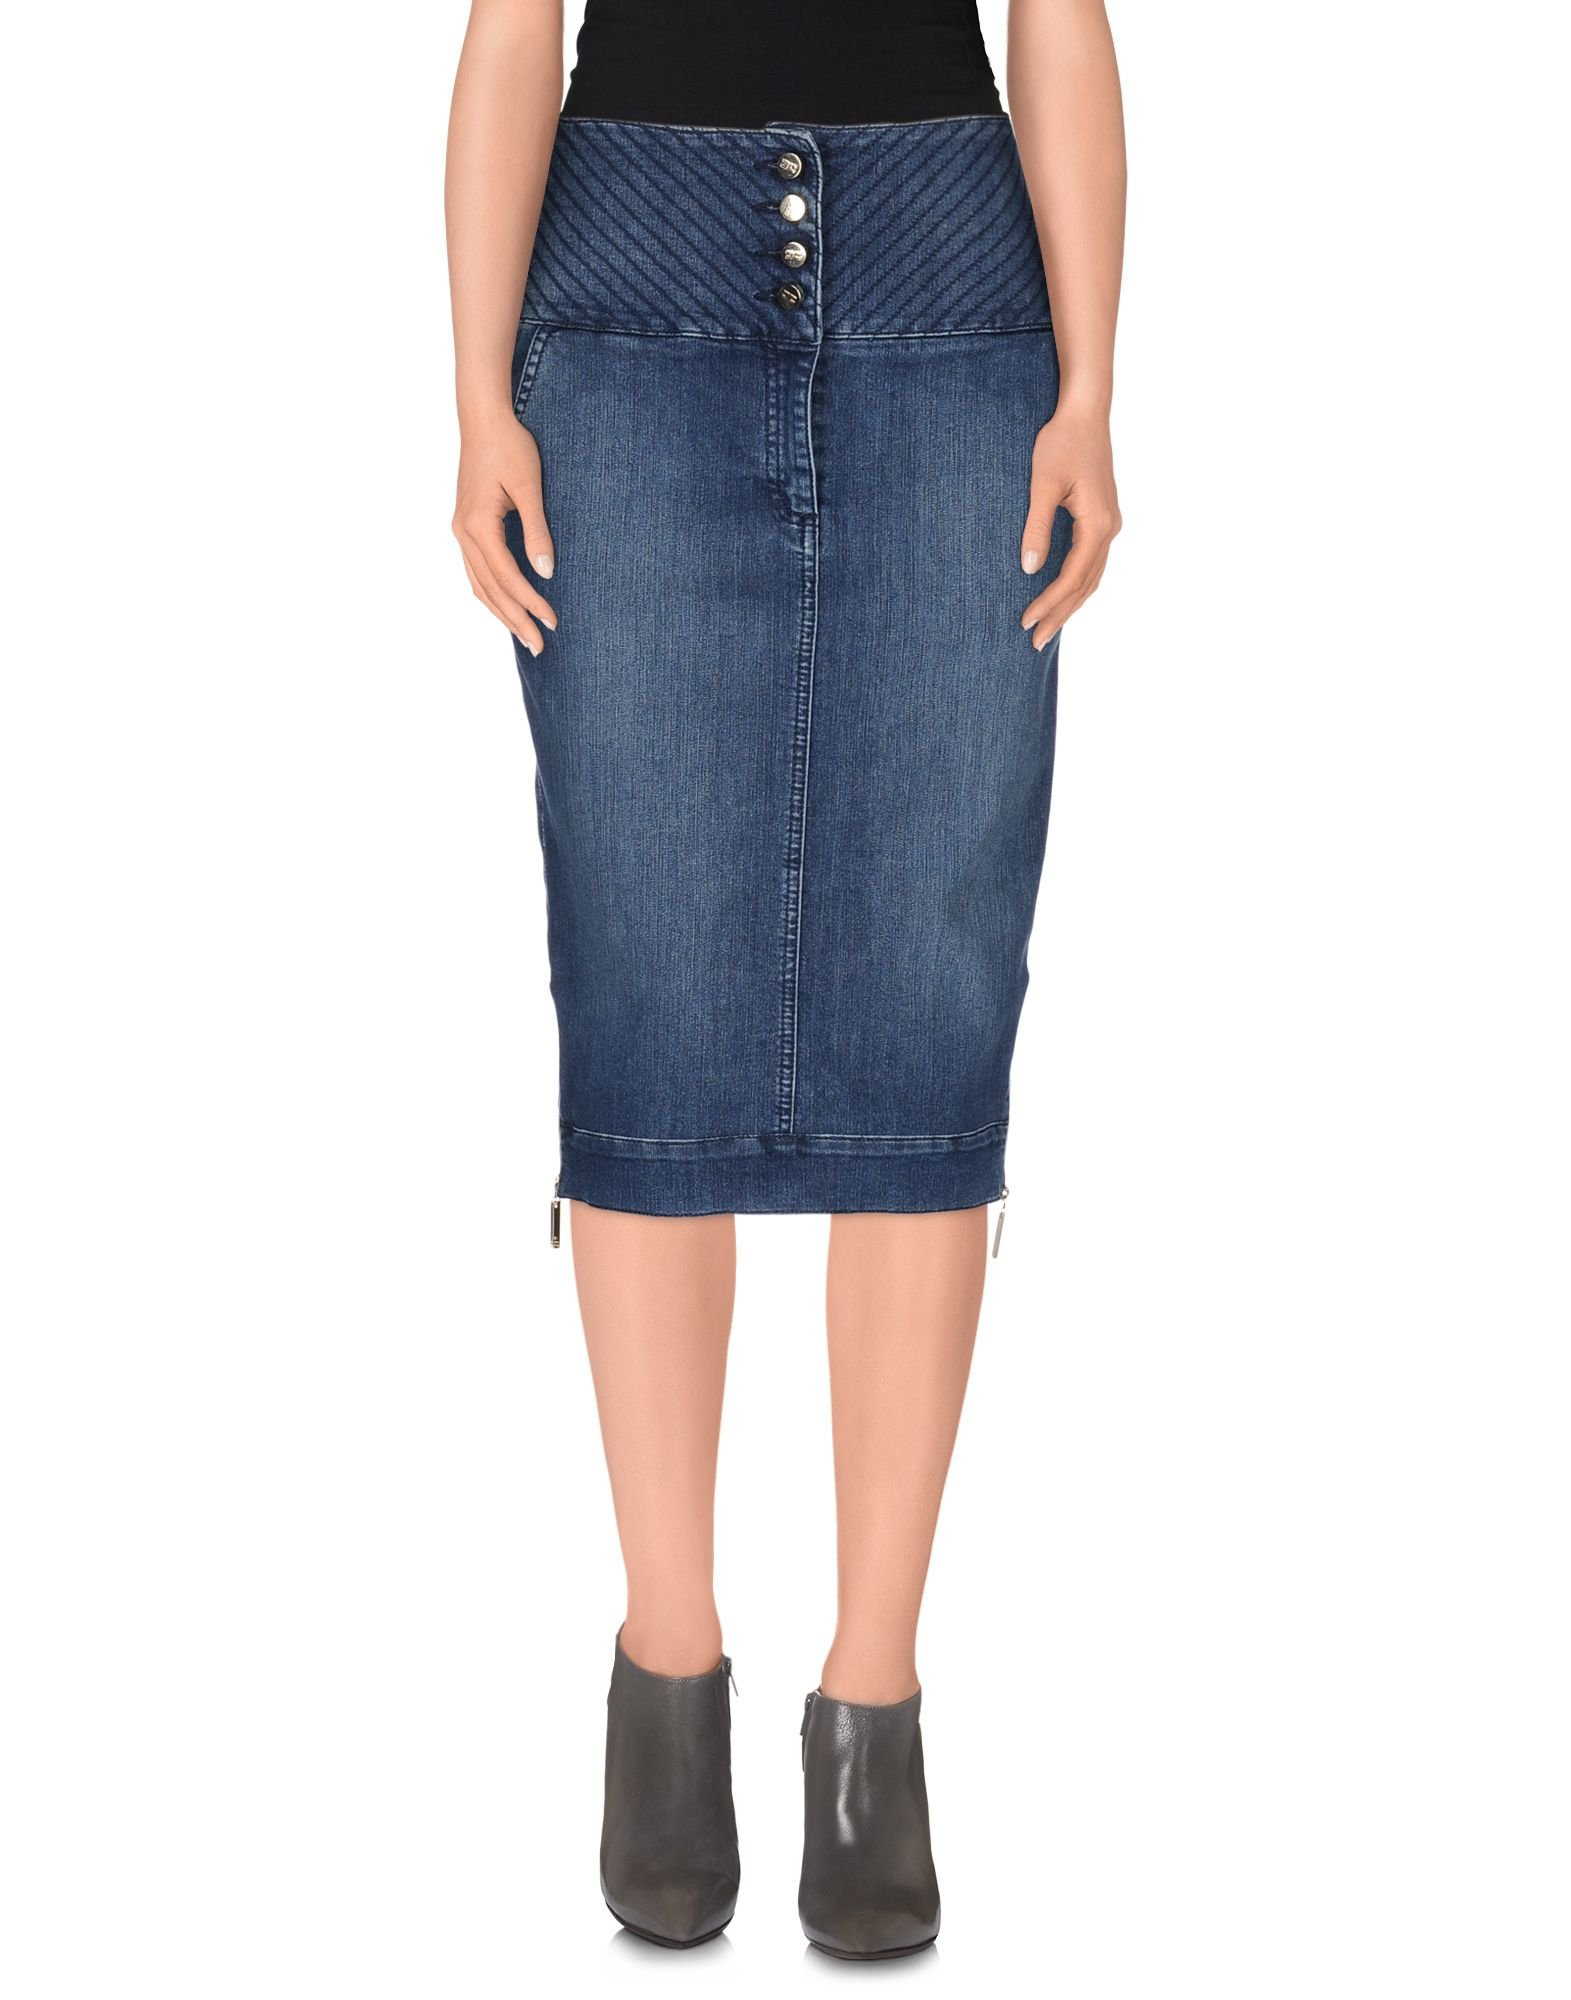 b99f909ef elisabetta-franchi-jeans-blue-denim-skirt-product-1-954566660-normal.jpeg